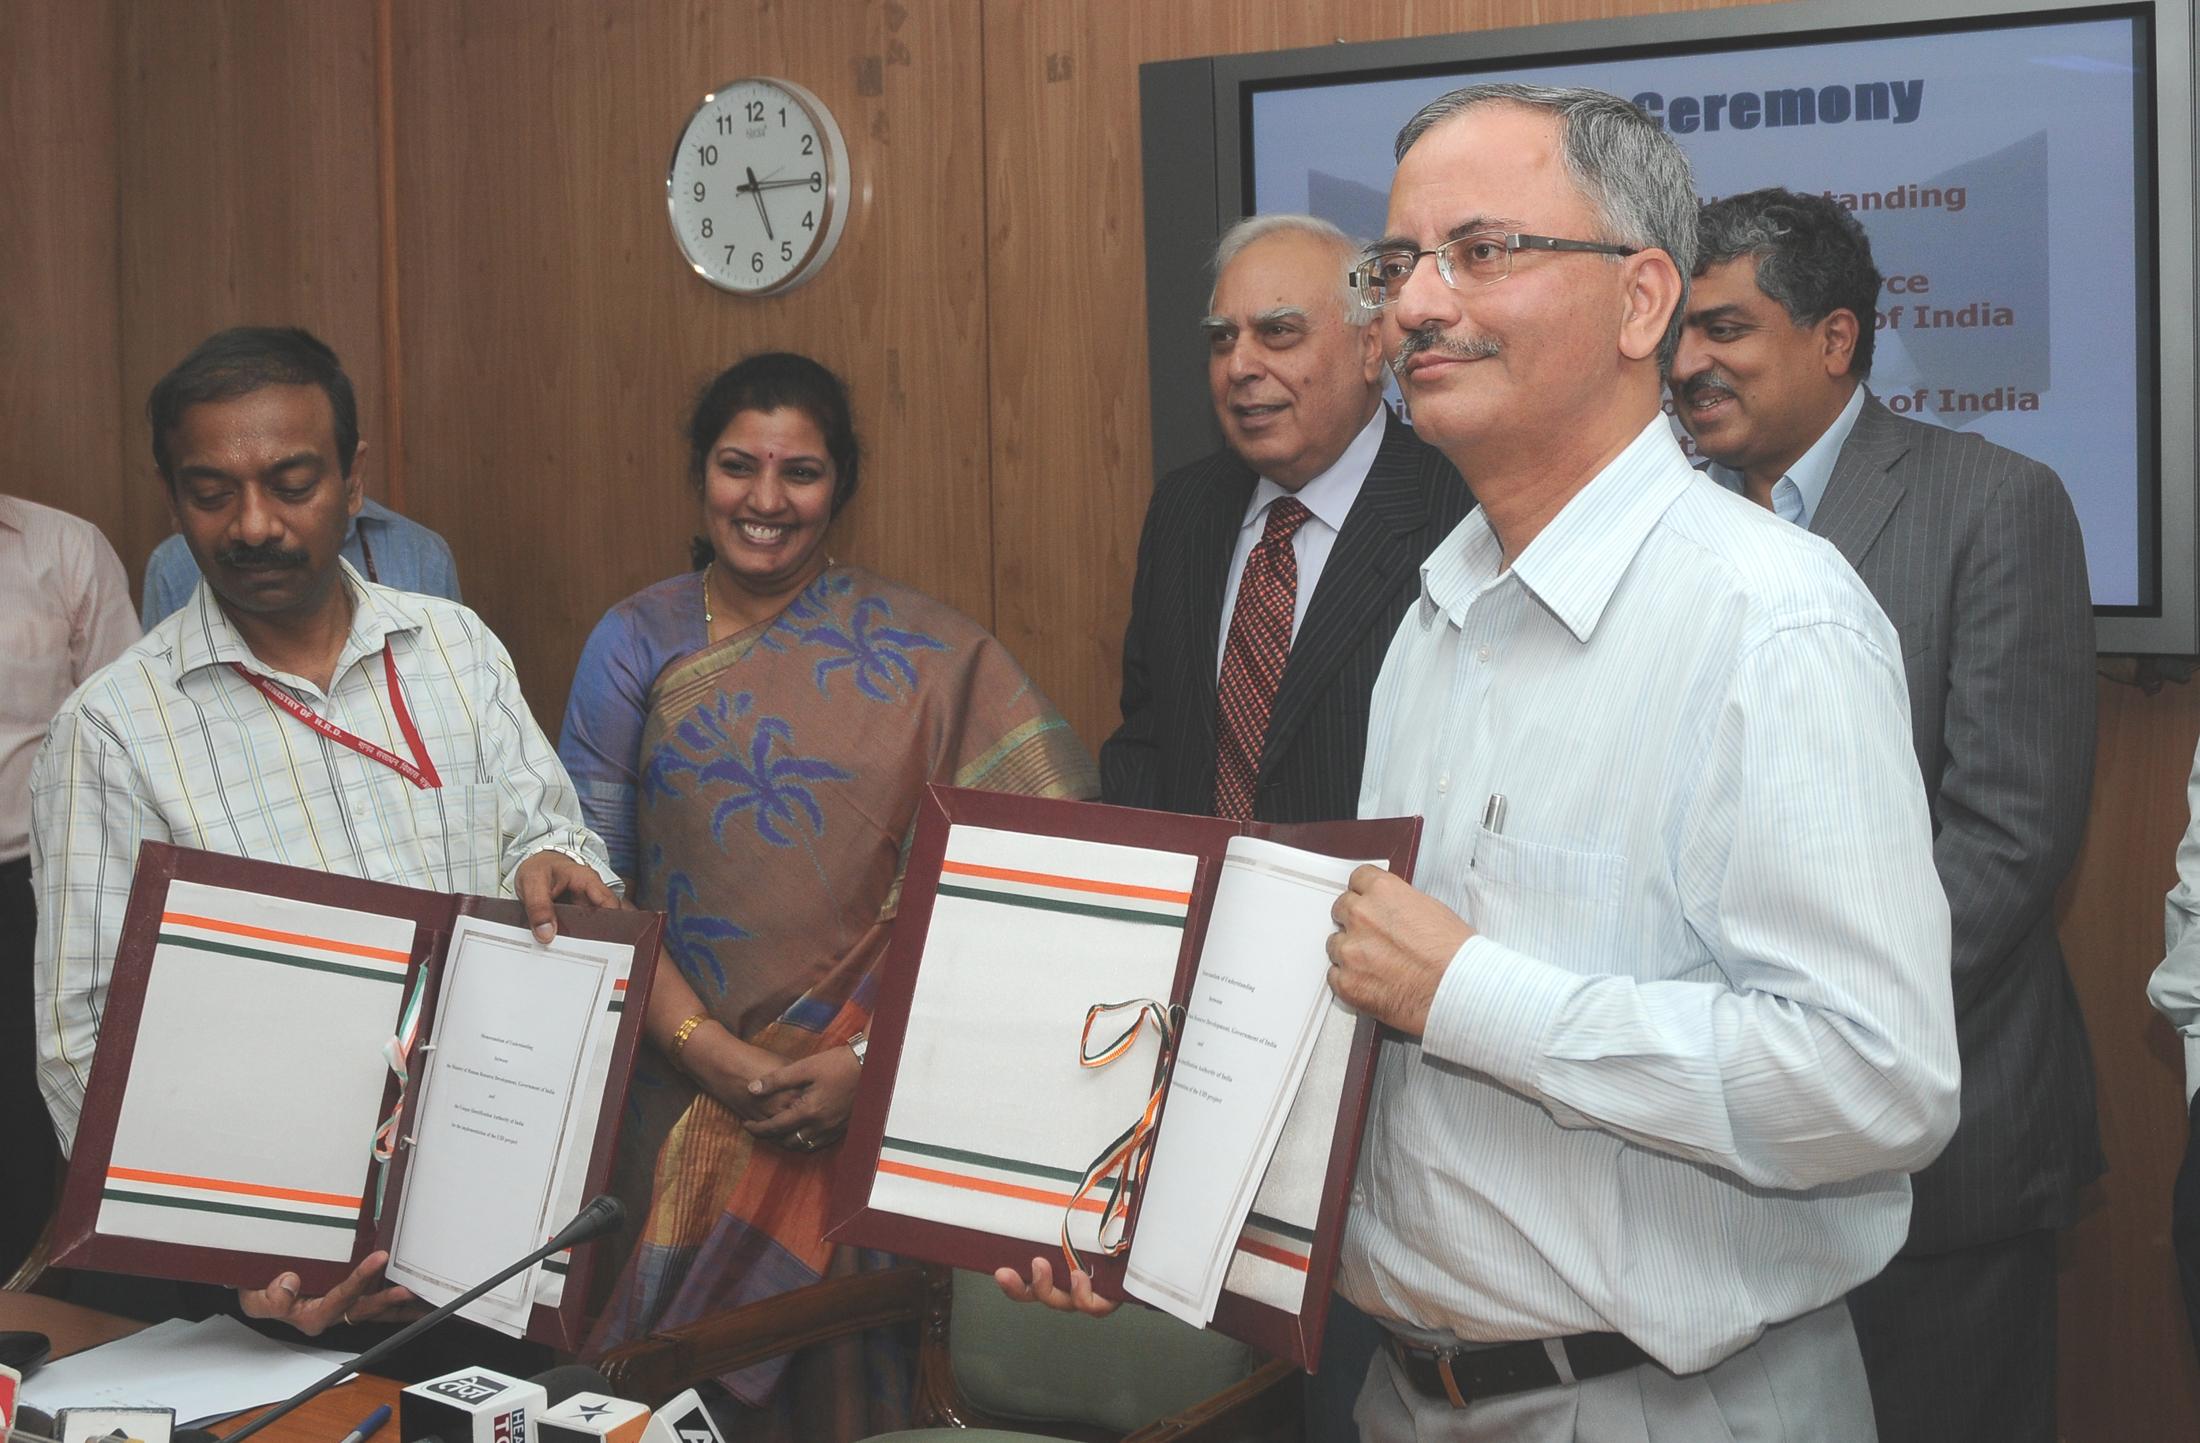 File:Kapil Sibal, the Chairman, UIDAI, Shri Nandan Nilekani